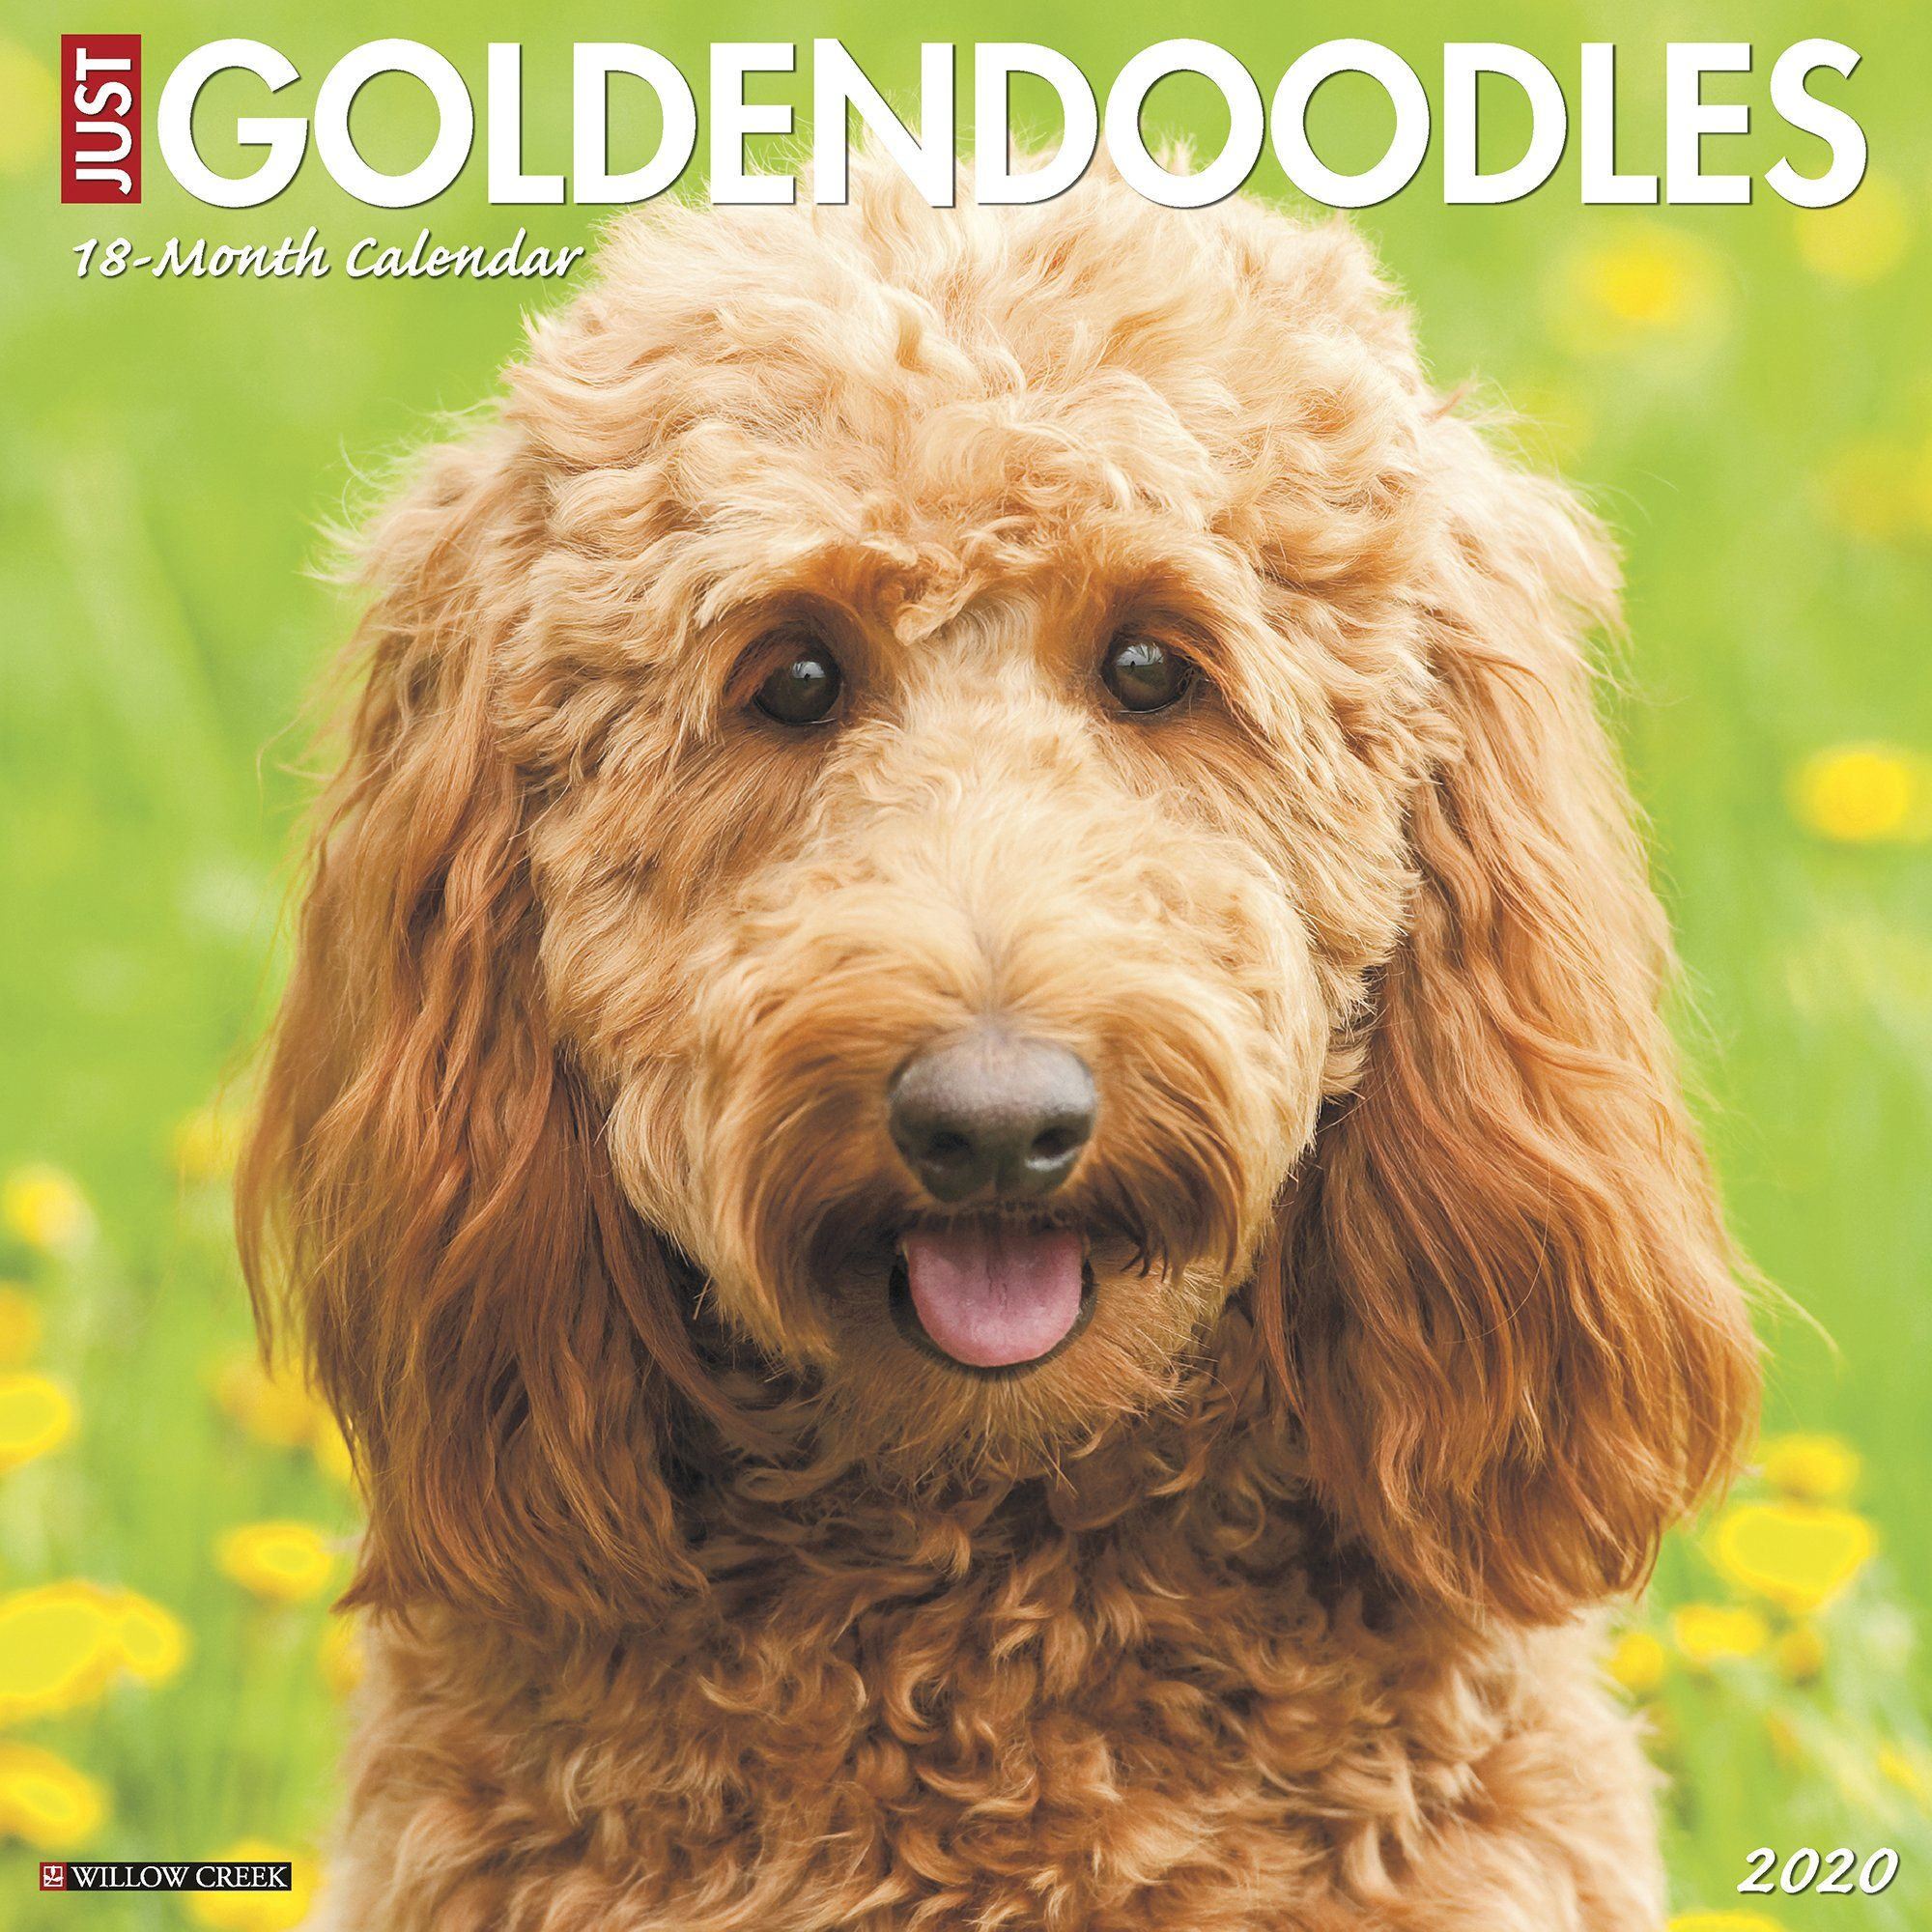 Willow Creek Press Goldendoodles 2020 Wall Calendar Goldendoodle Breeds Wall Calendar